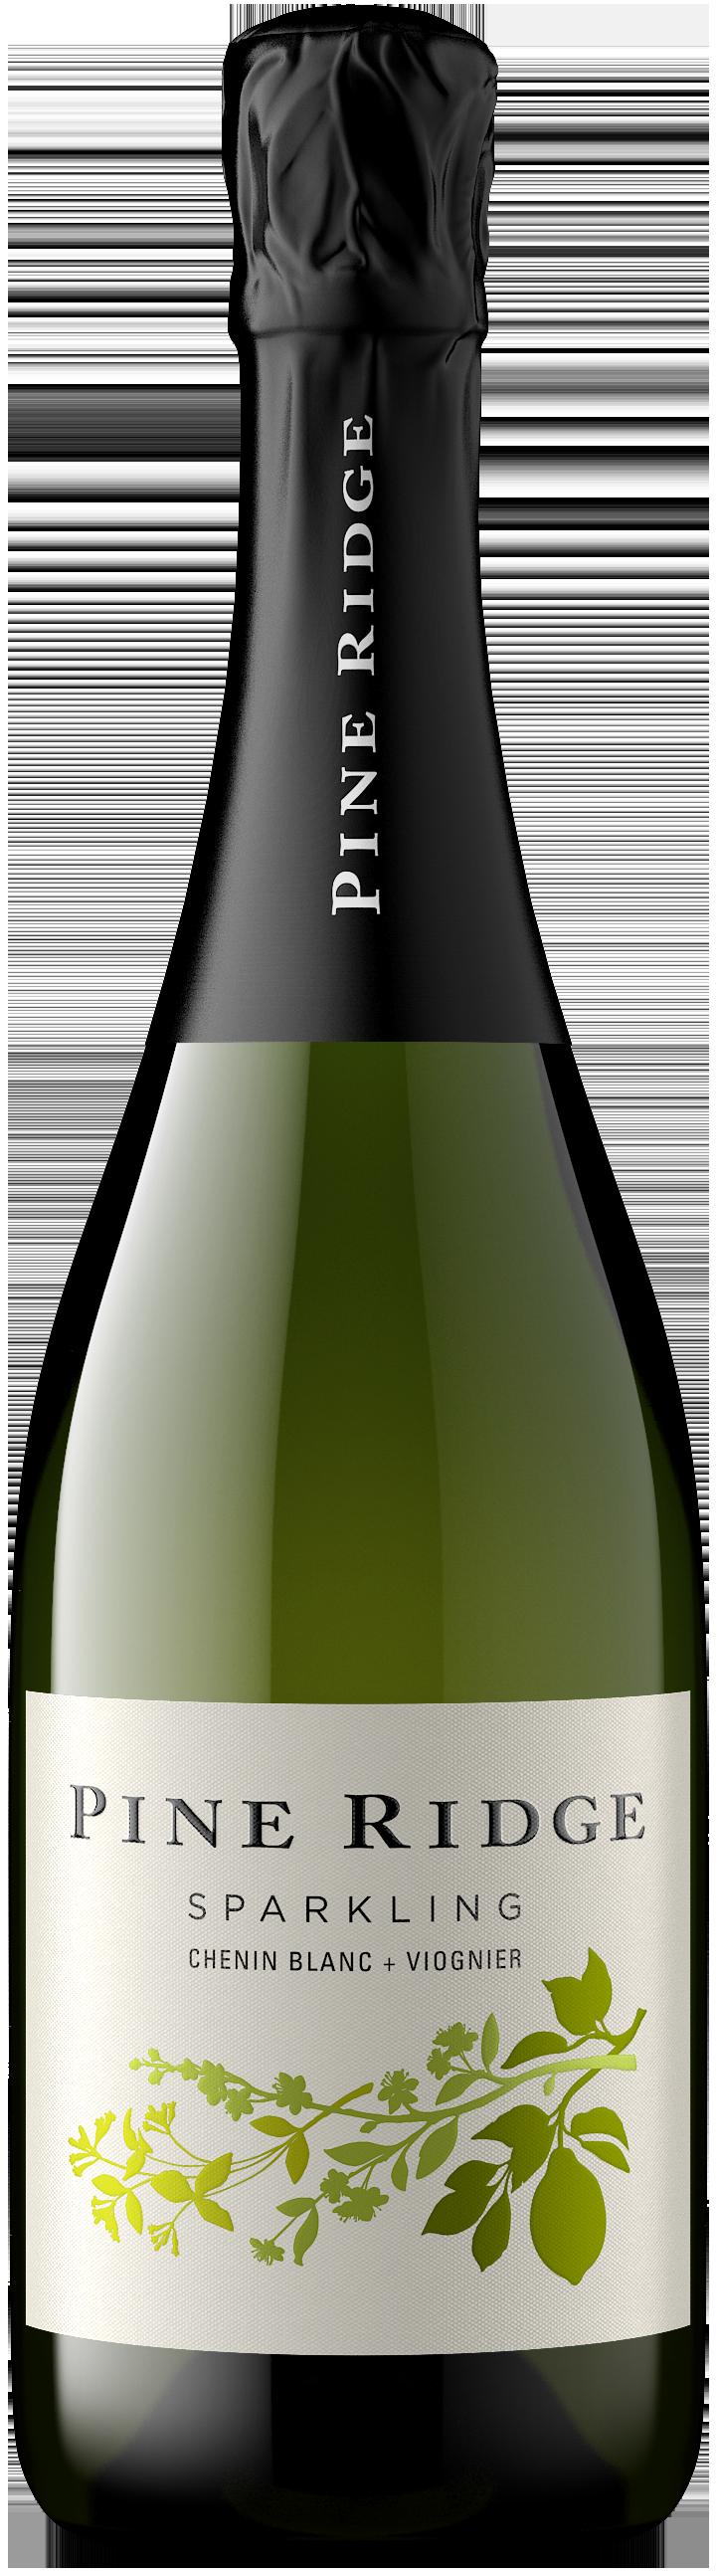 Pine Ridge Sparkling Chenin Blanc & Viognier